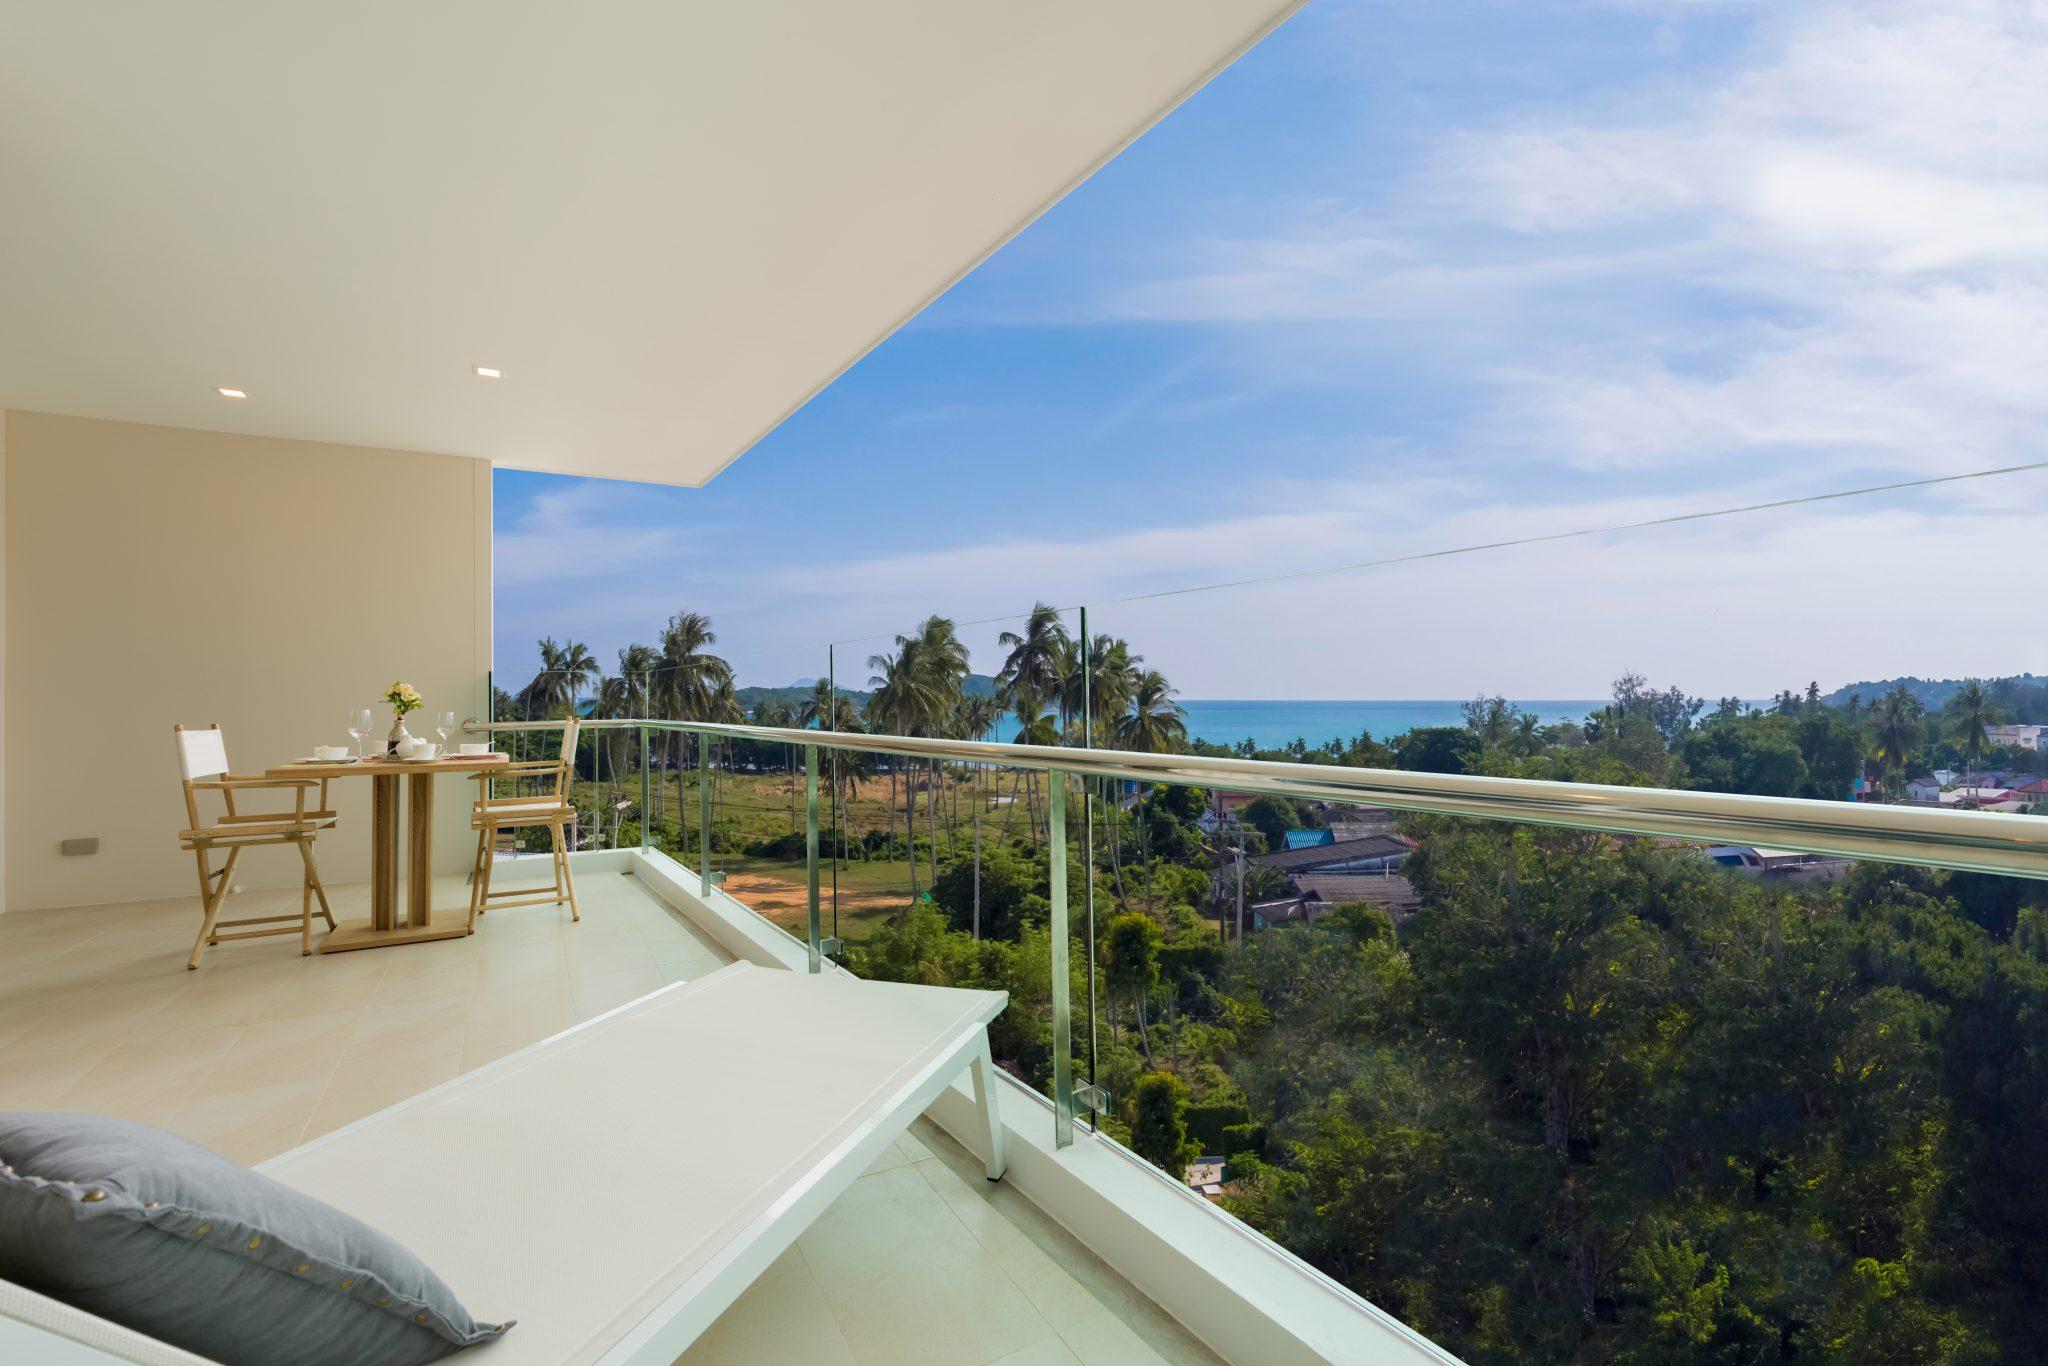 Phuket Real Estate Agency – Rawai Beach (7)